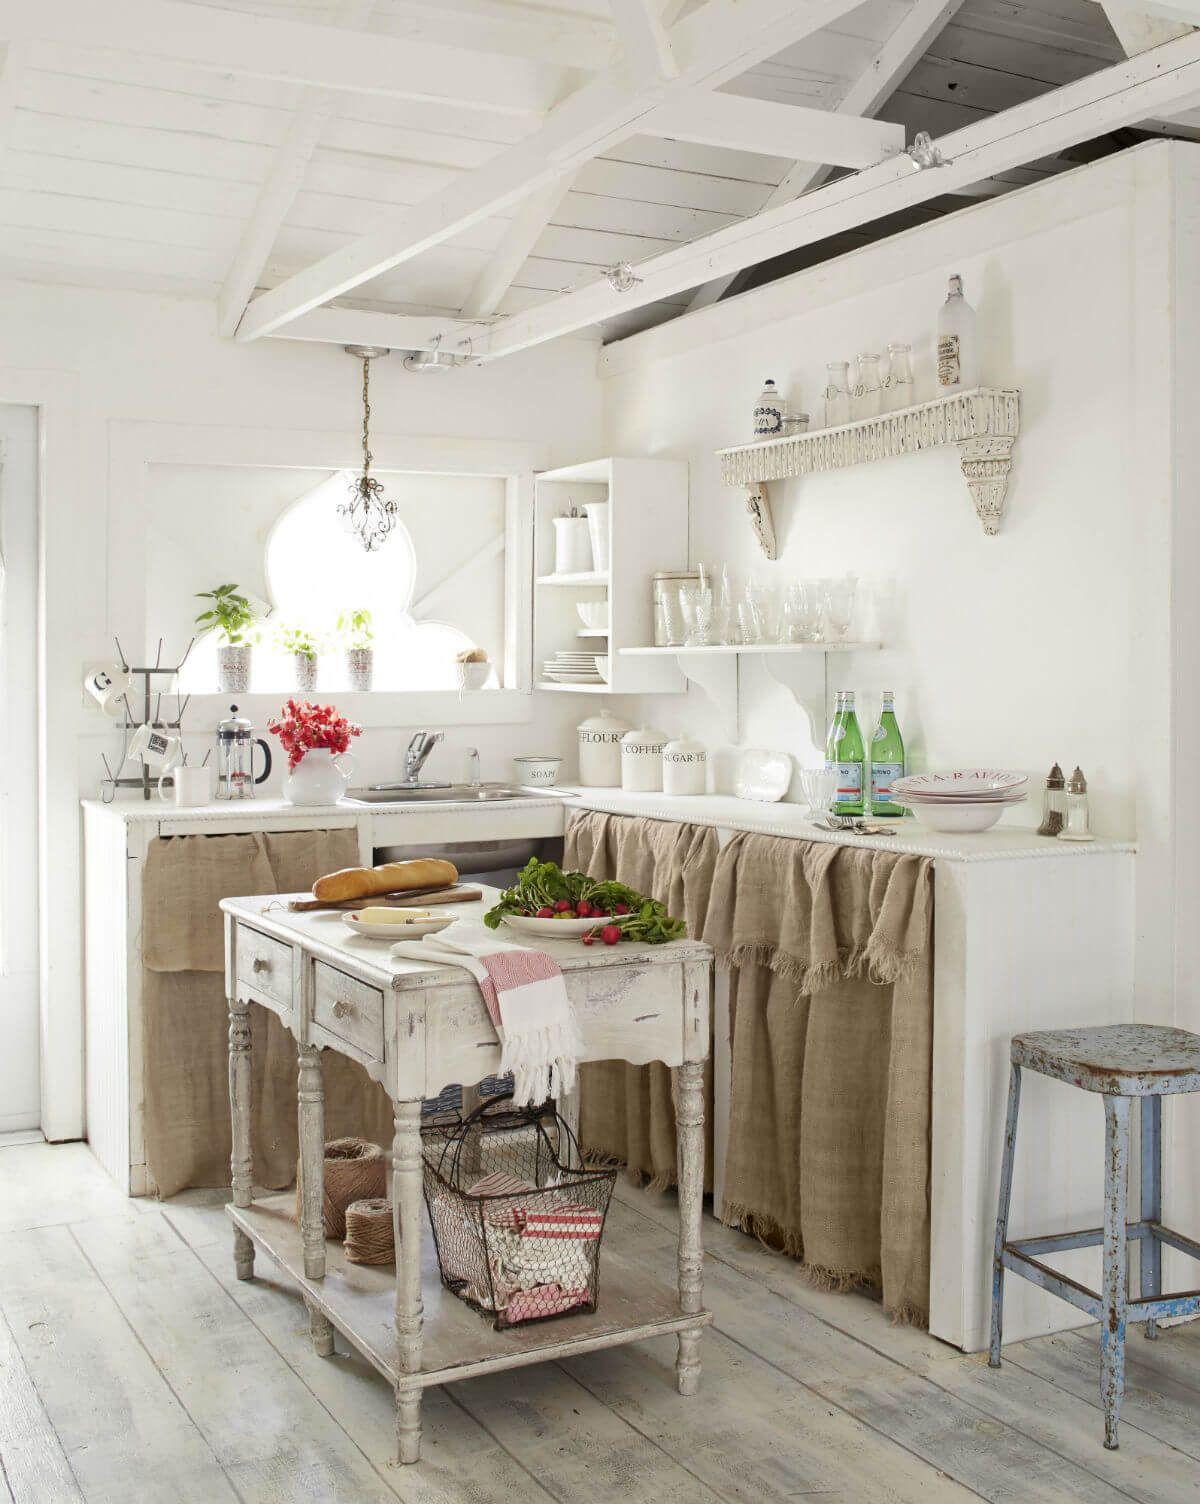 15 Unique Kitchen Cabinet Curtain Ideas for an Adorable Home Decor